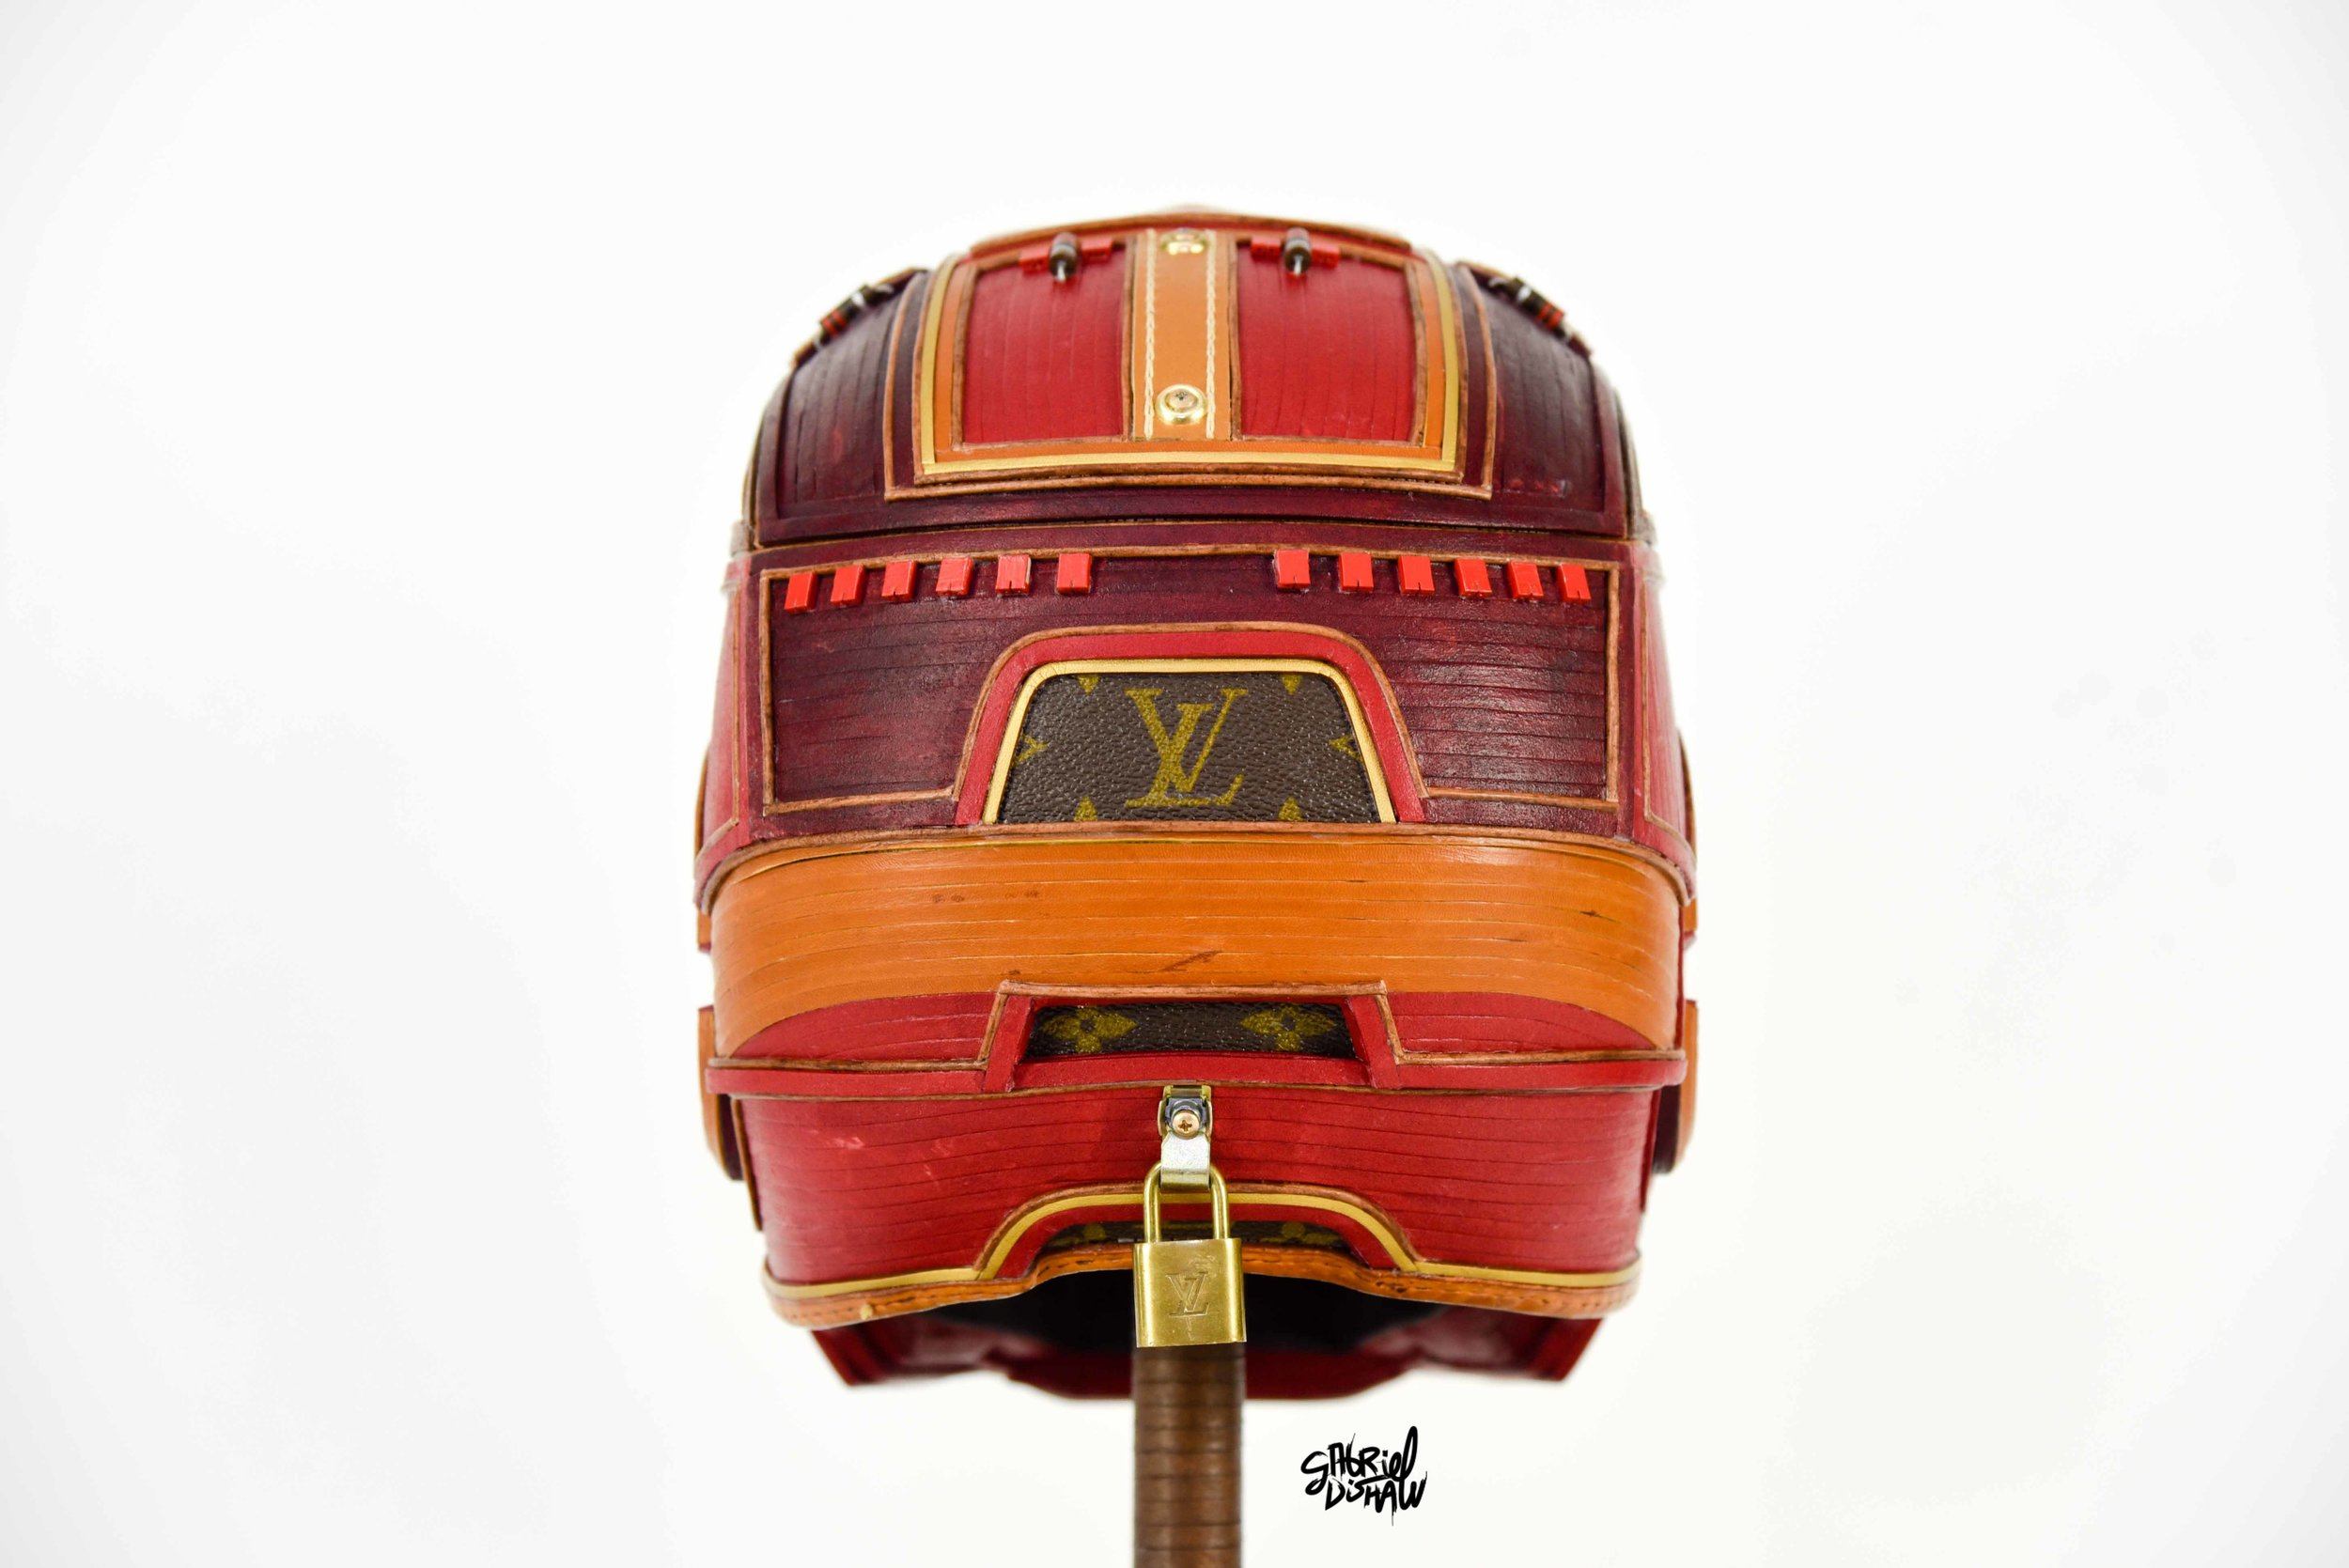 Gabriel Dishaw Iron Man LV-4198.jpg